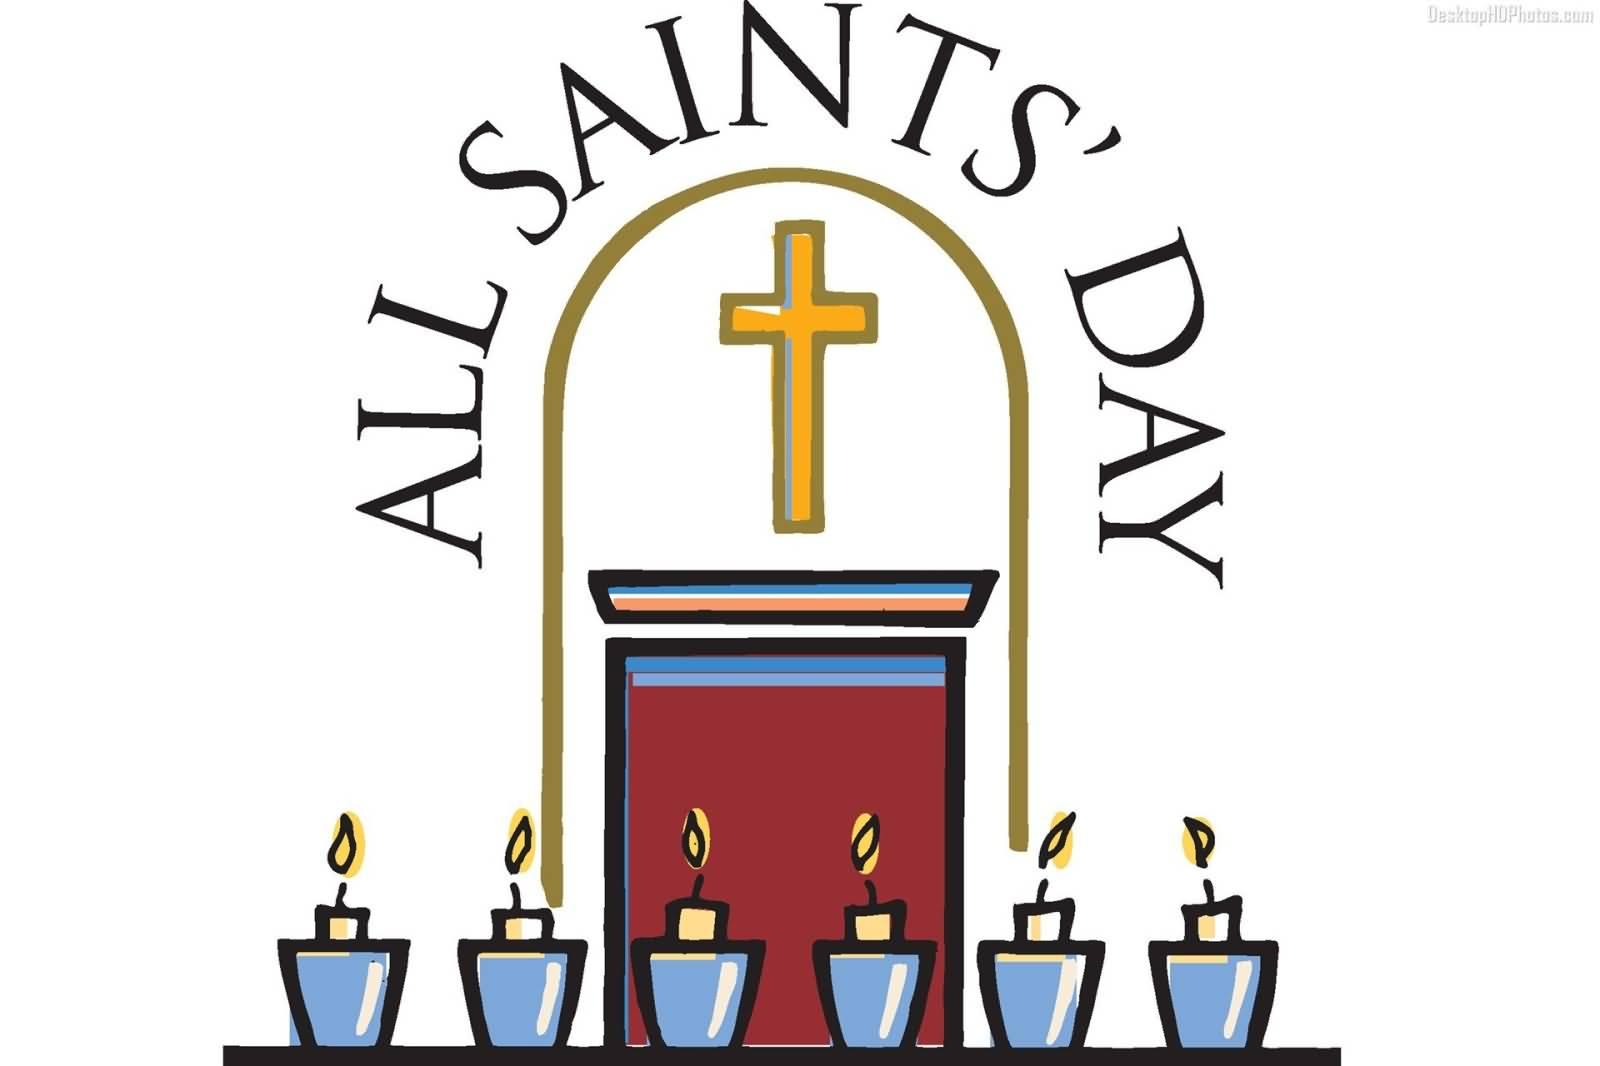 ... All Saints Day Clip Art - clipartall-... All Saints Day Clip Art - clipartall ...-3